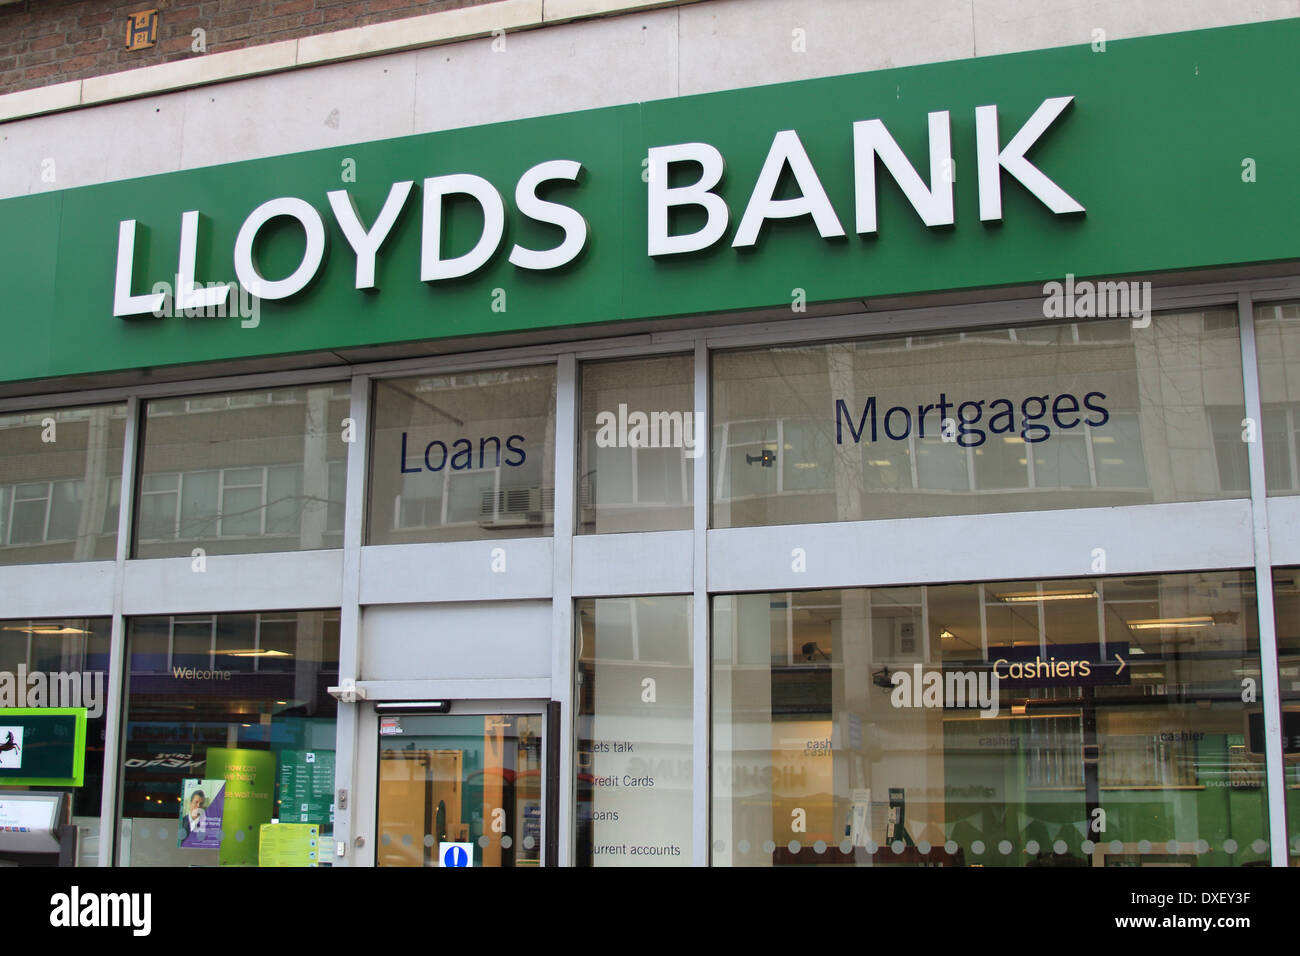 Branch of Lloyds Bank on Tottenham Court Road, London, UK - Stock Image